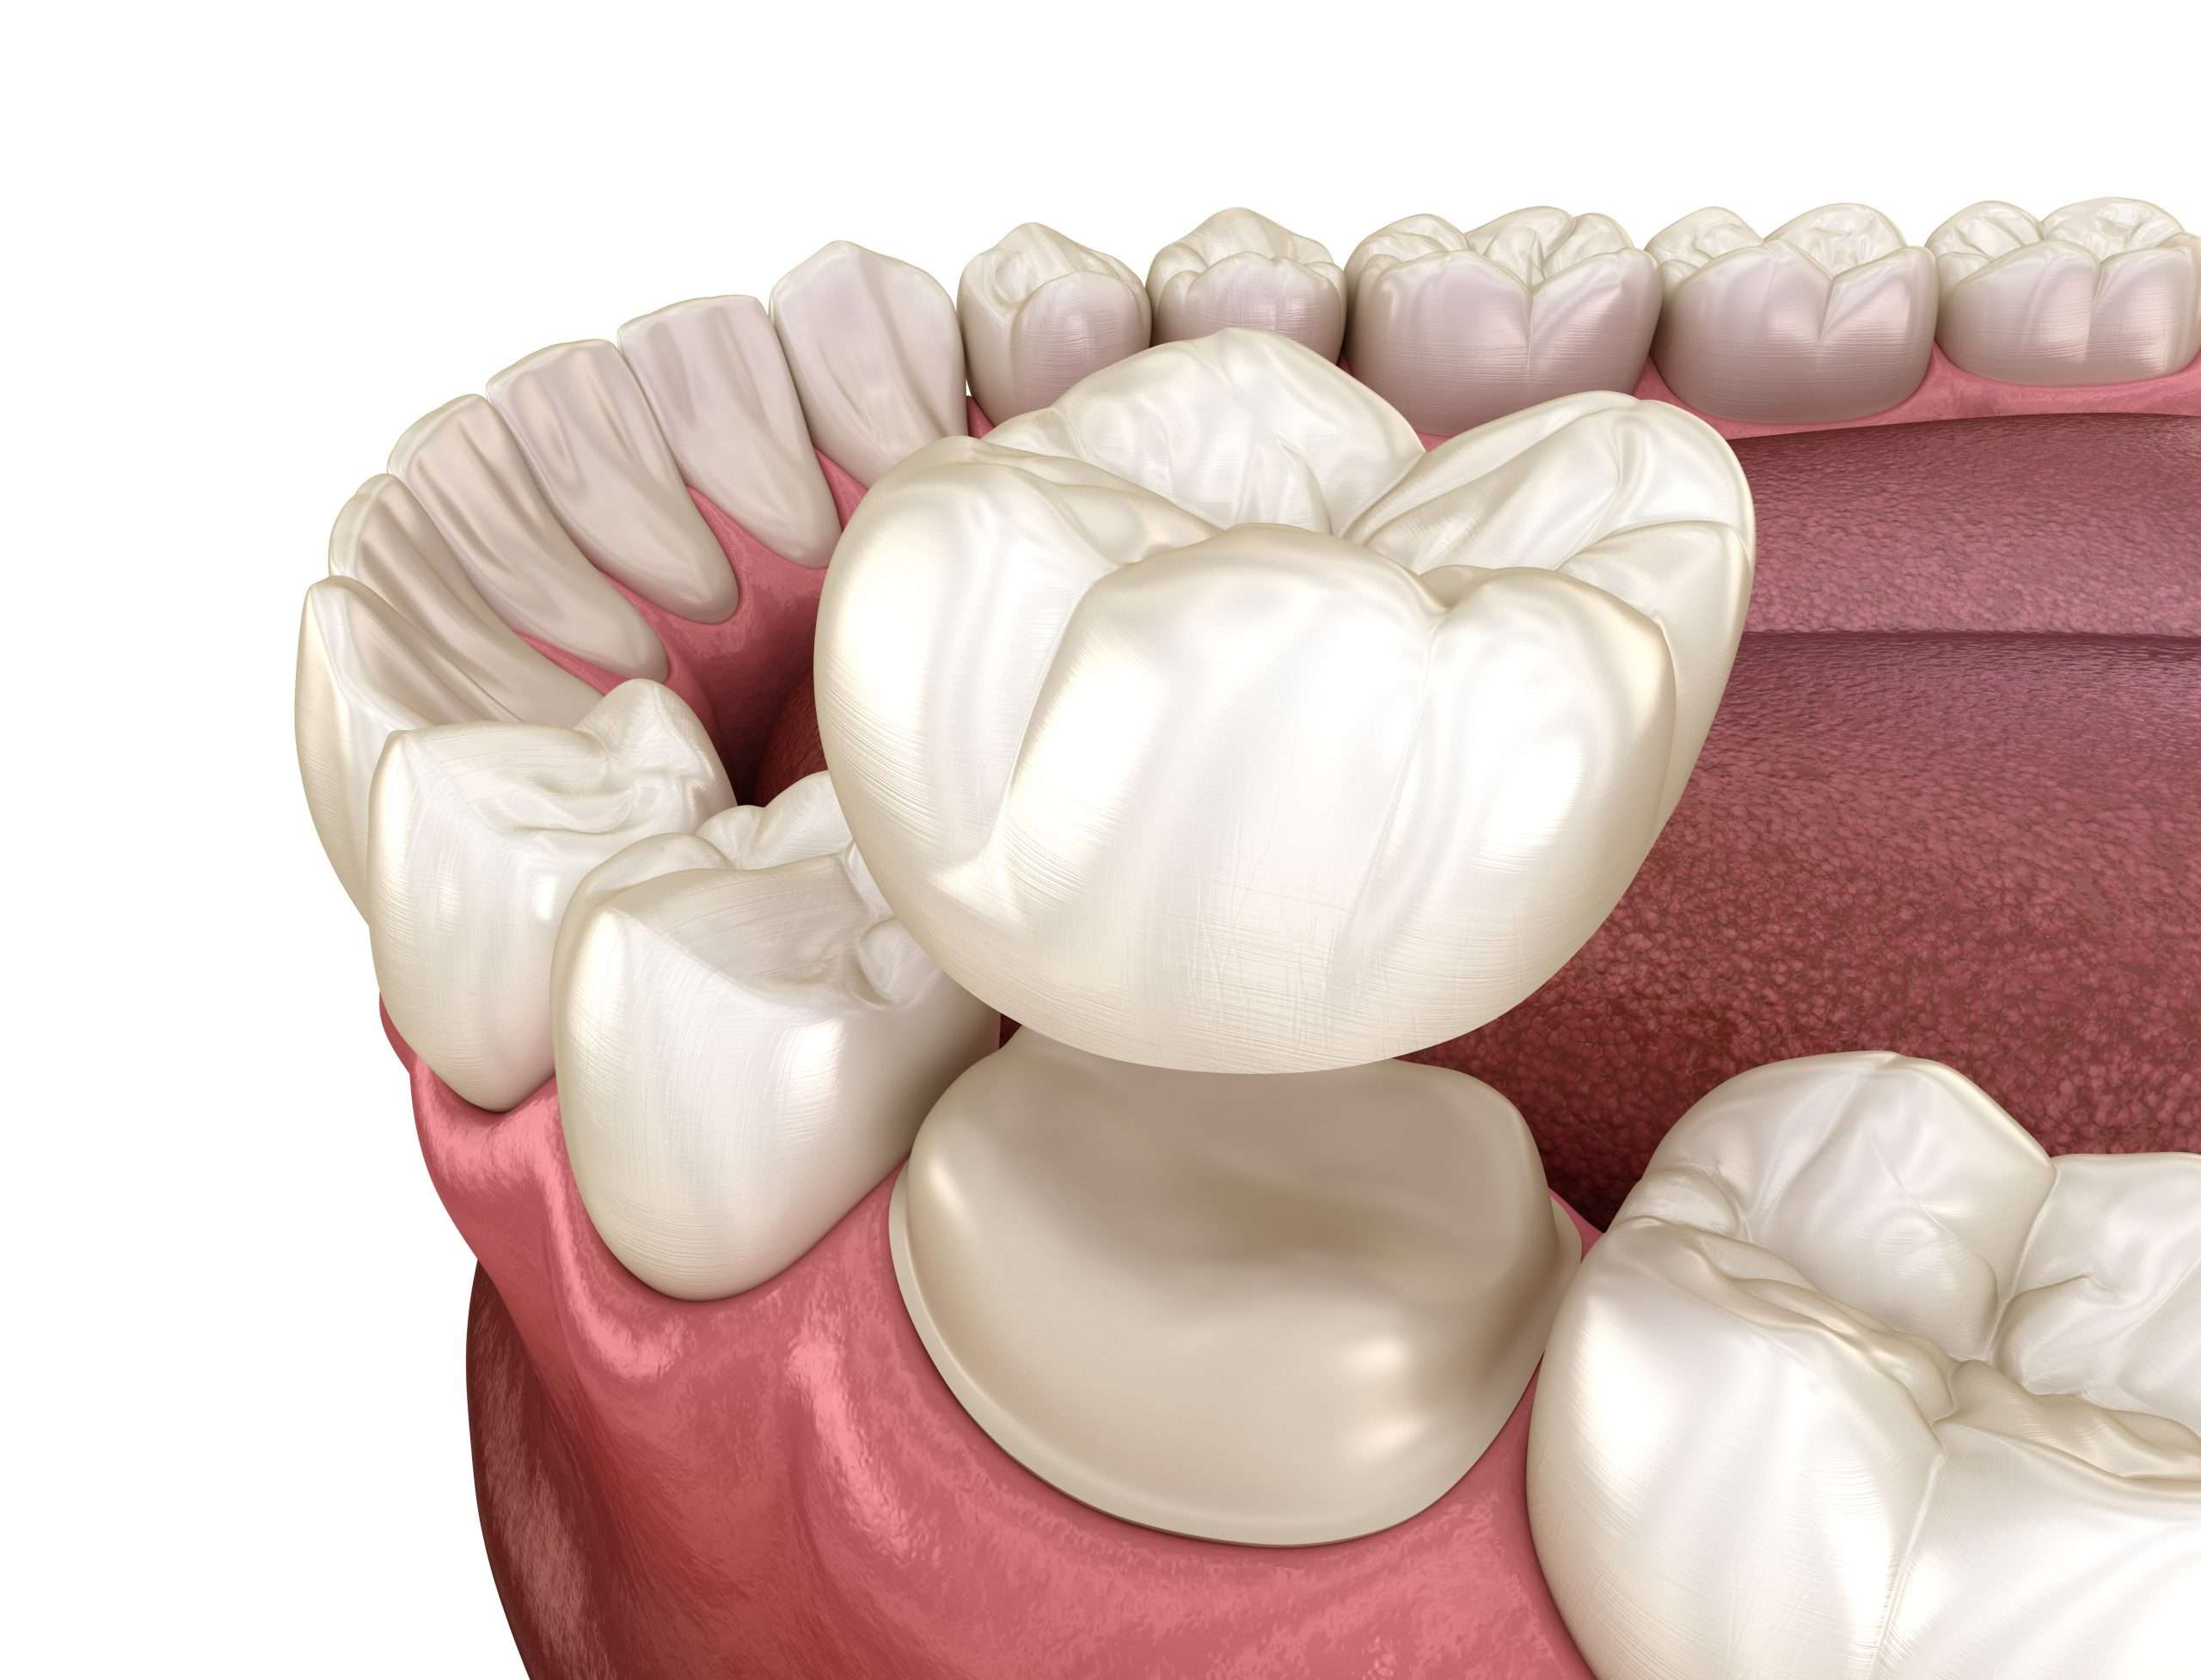 dental-crown-merrylands-guildford